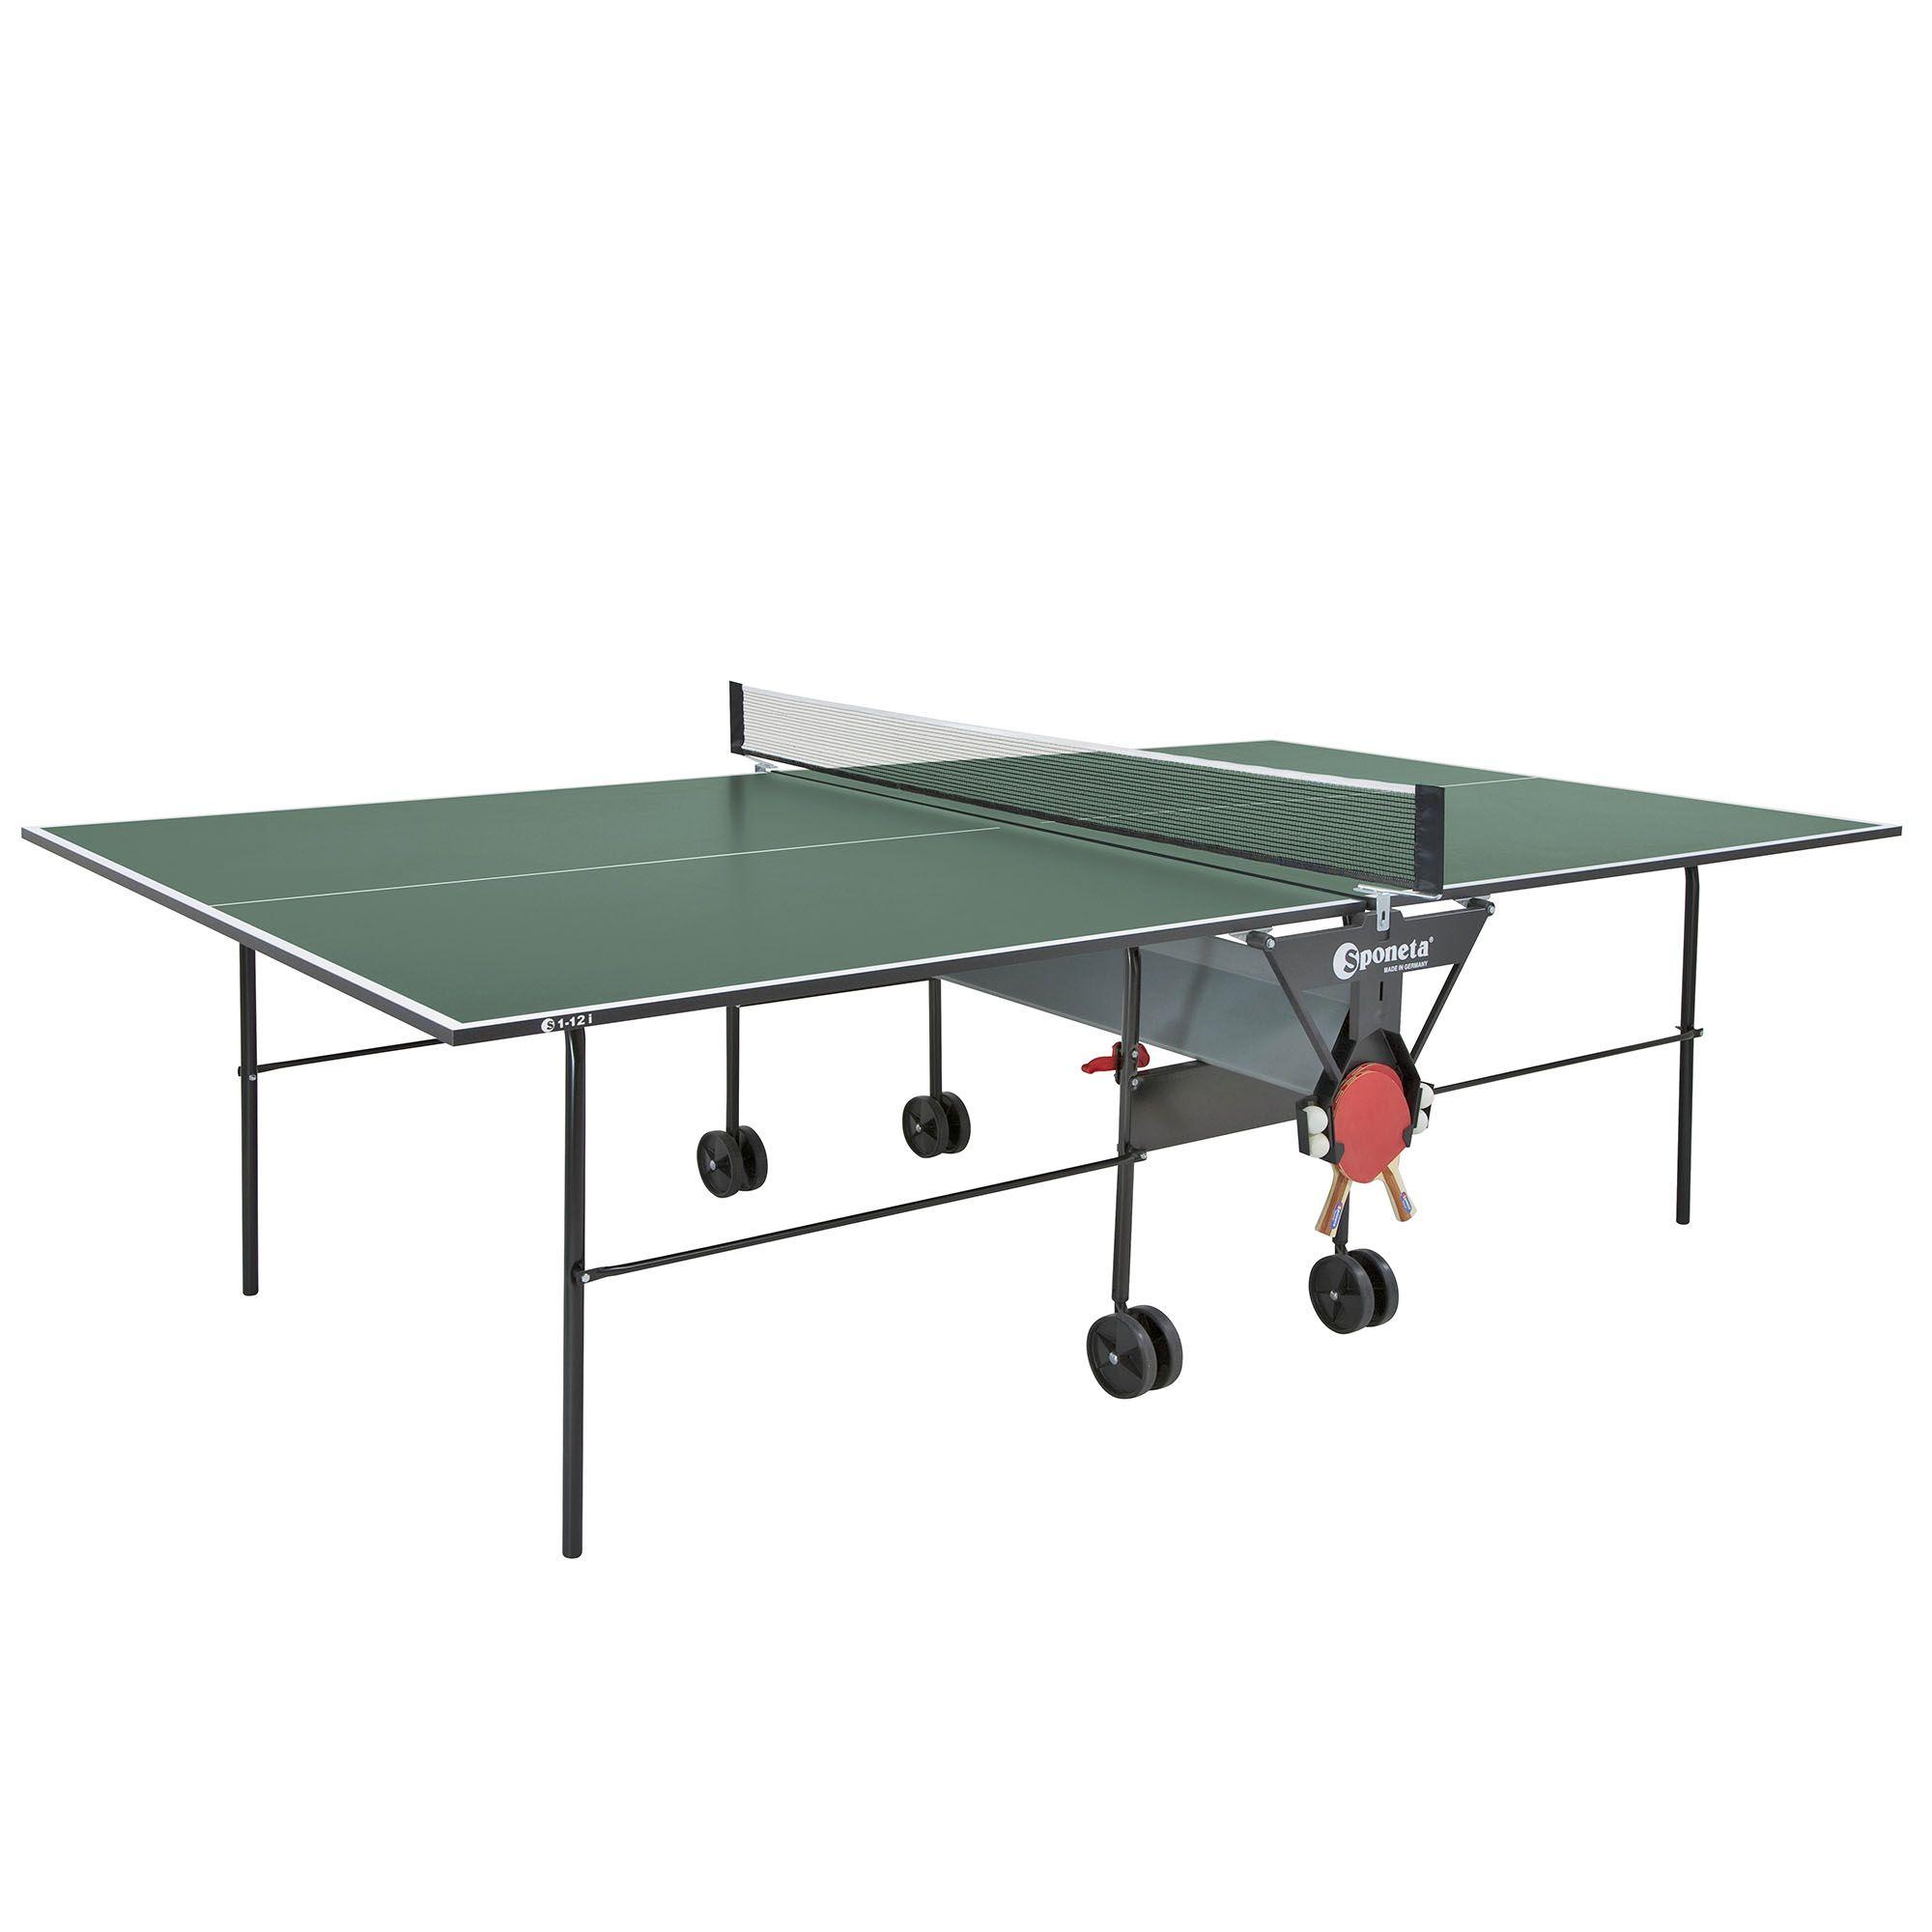 Sponeta Hobby Playback Indoor Table Tennis Table